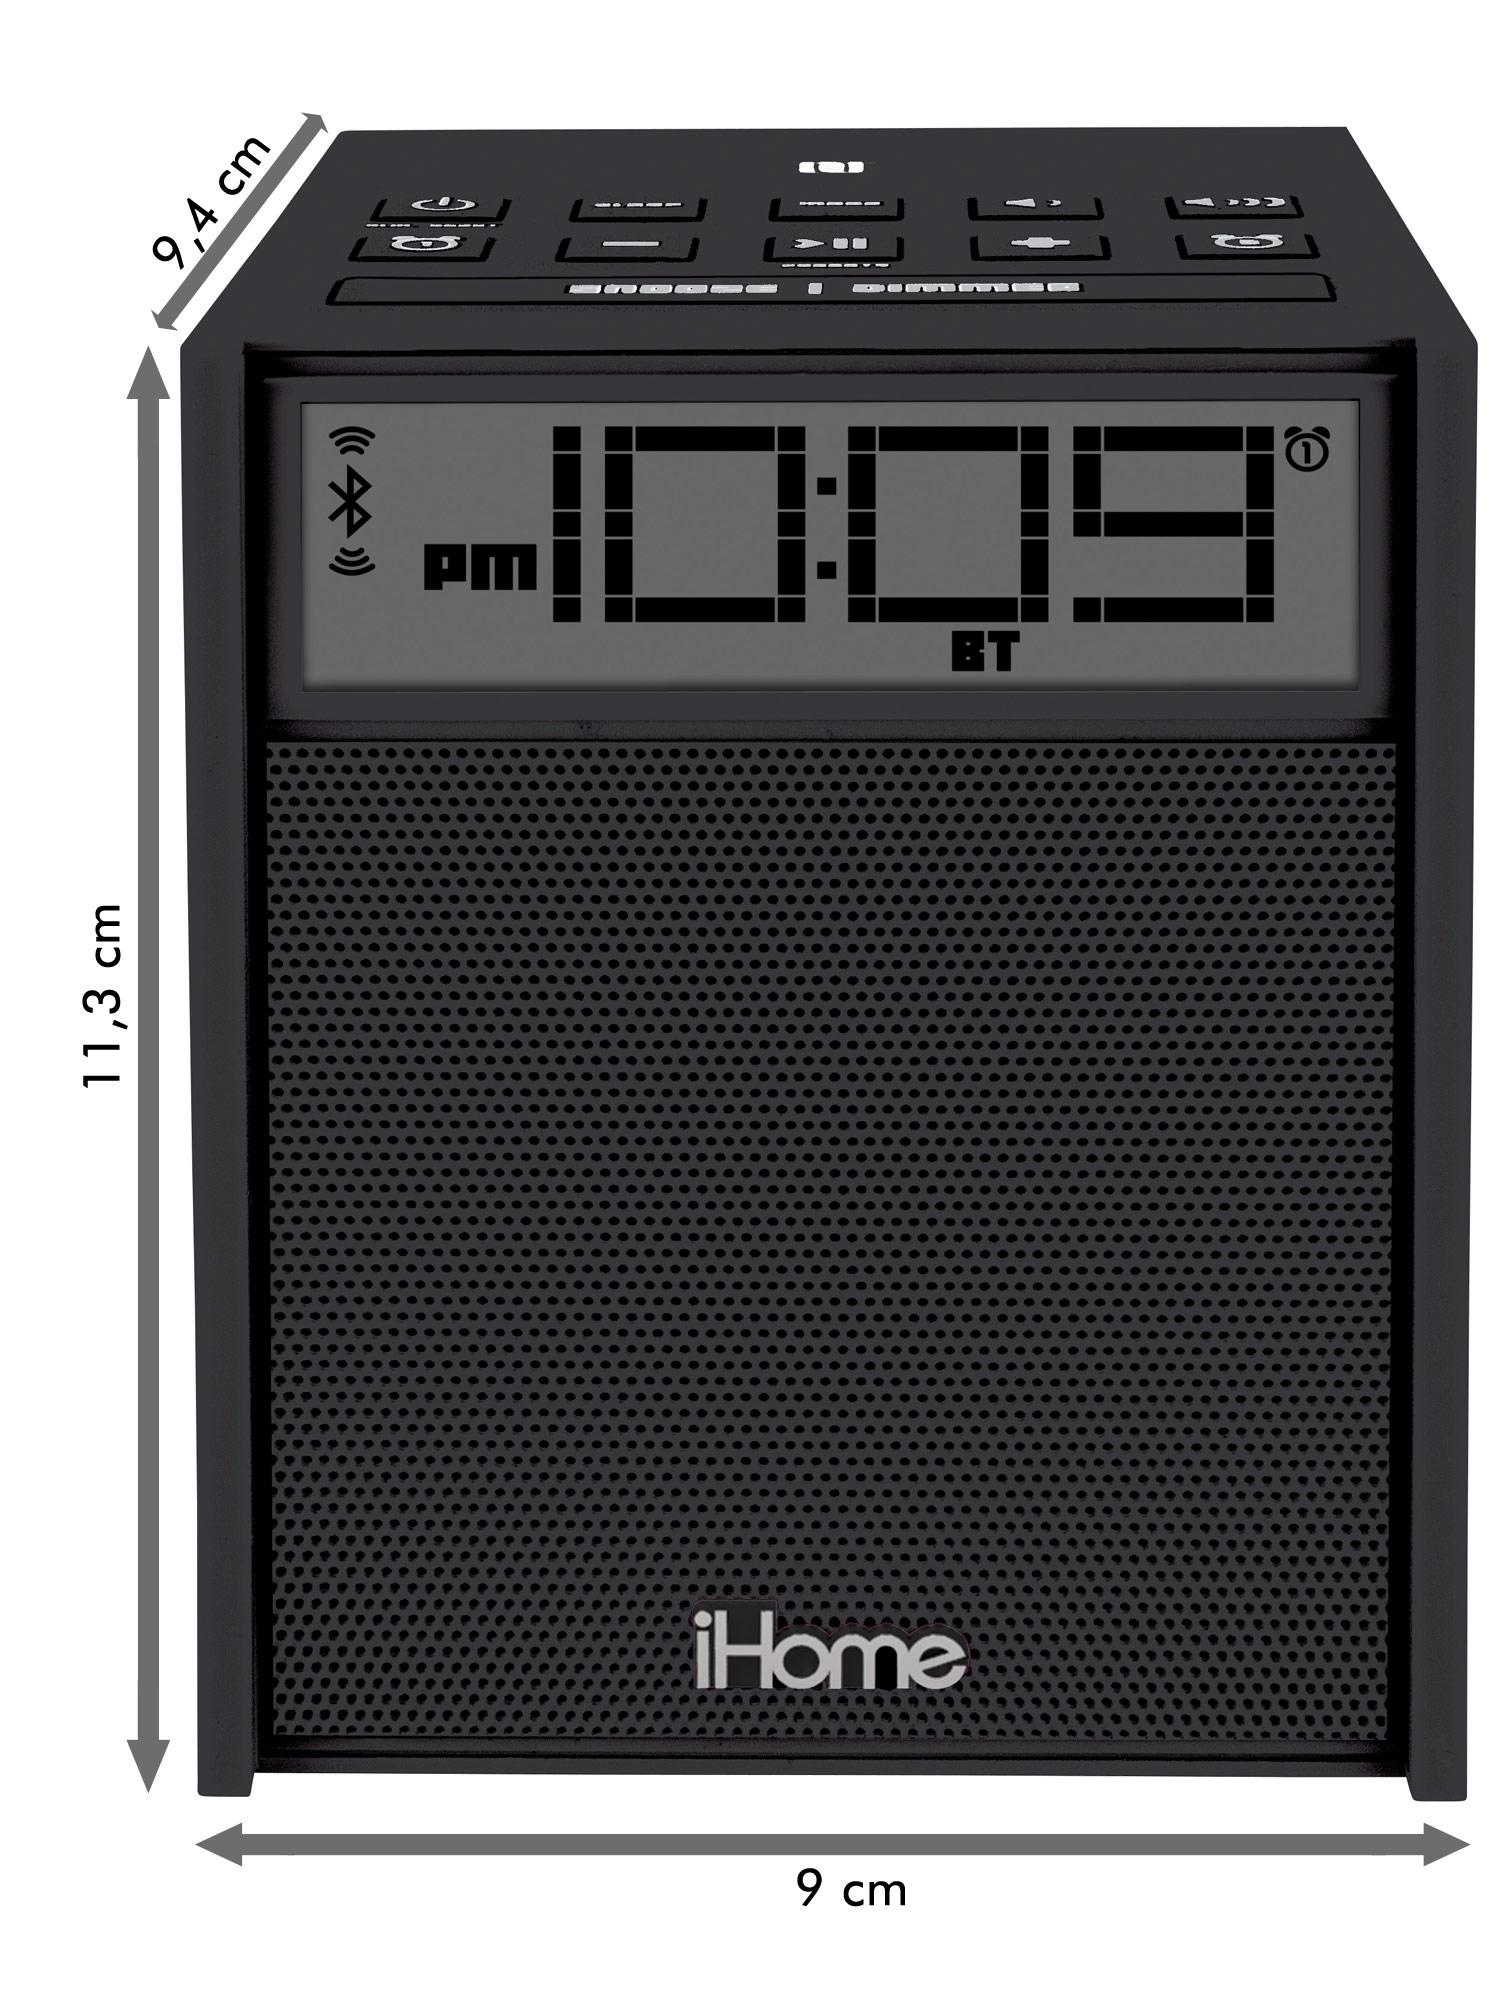 ihome ibn180 radiowecker nfc bluetooth fm radio dual alarm. Black Bedroom Furniture Sets. Home Design Ideas